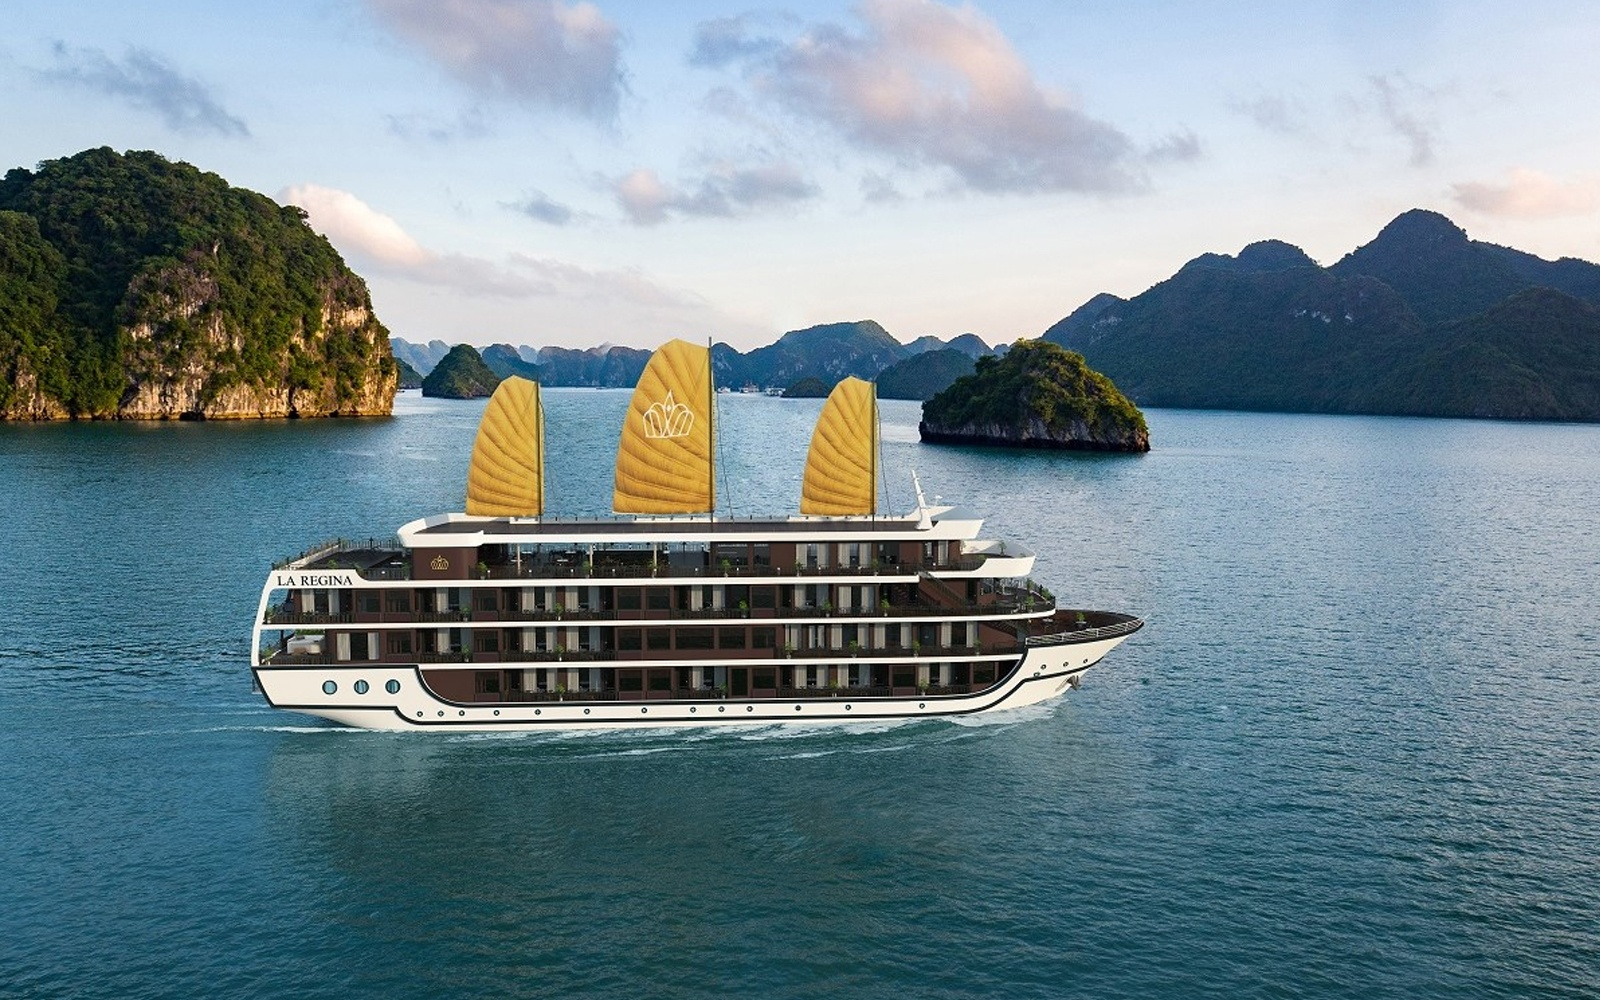 La Regina Grand Cruise 3 days/2 nights